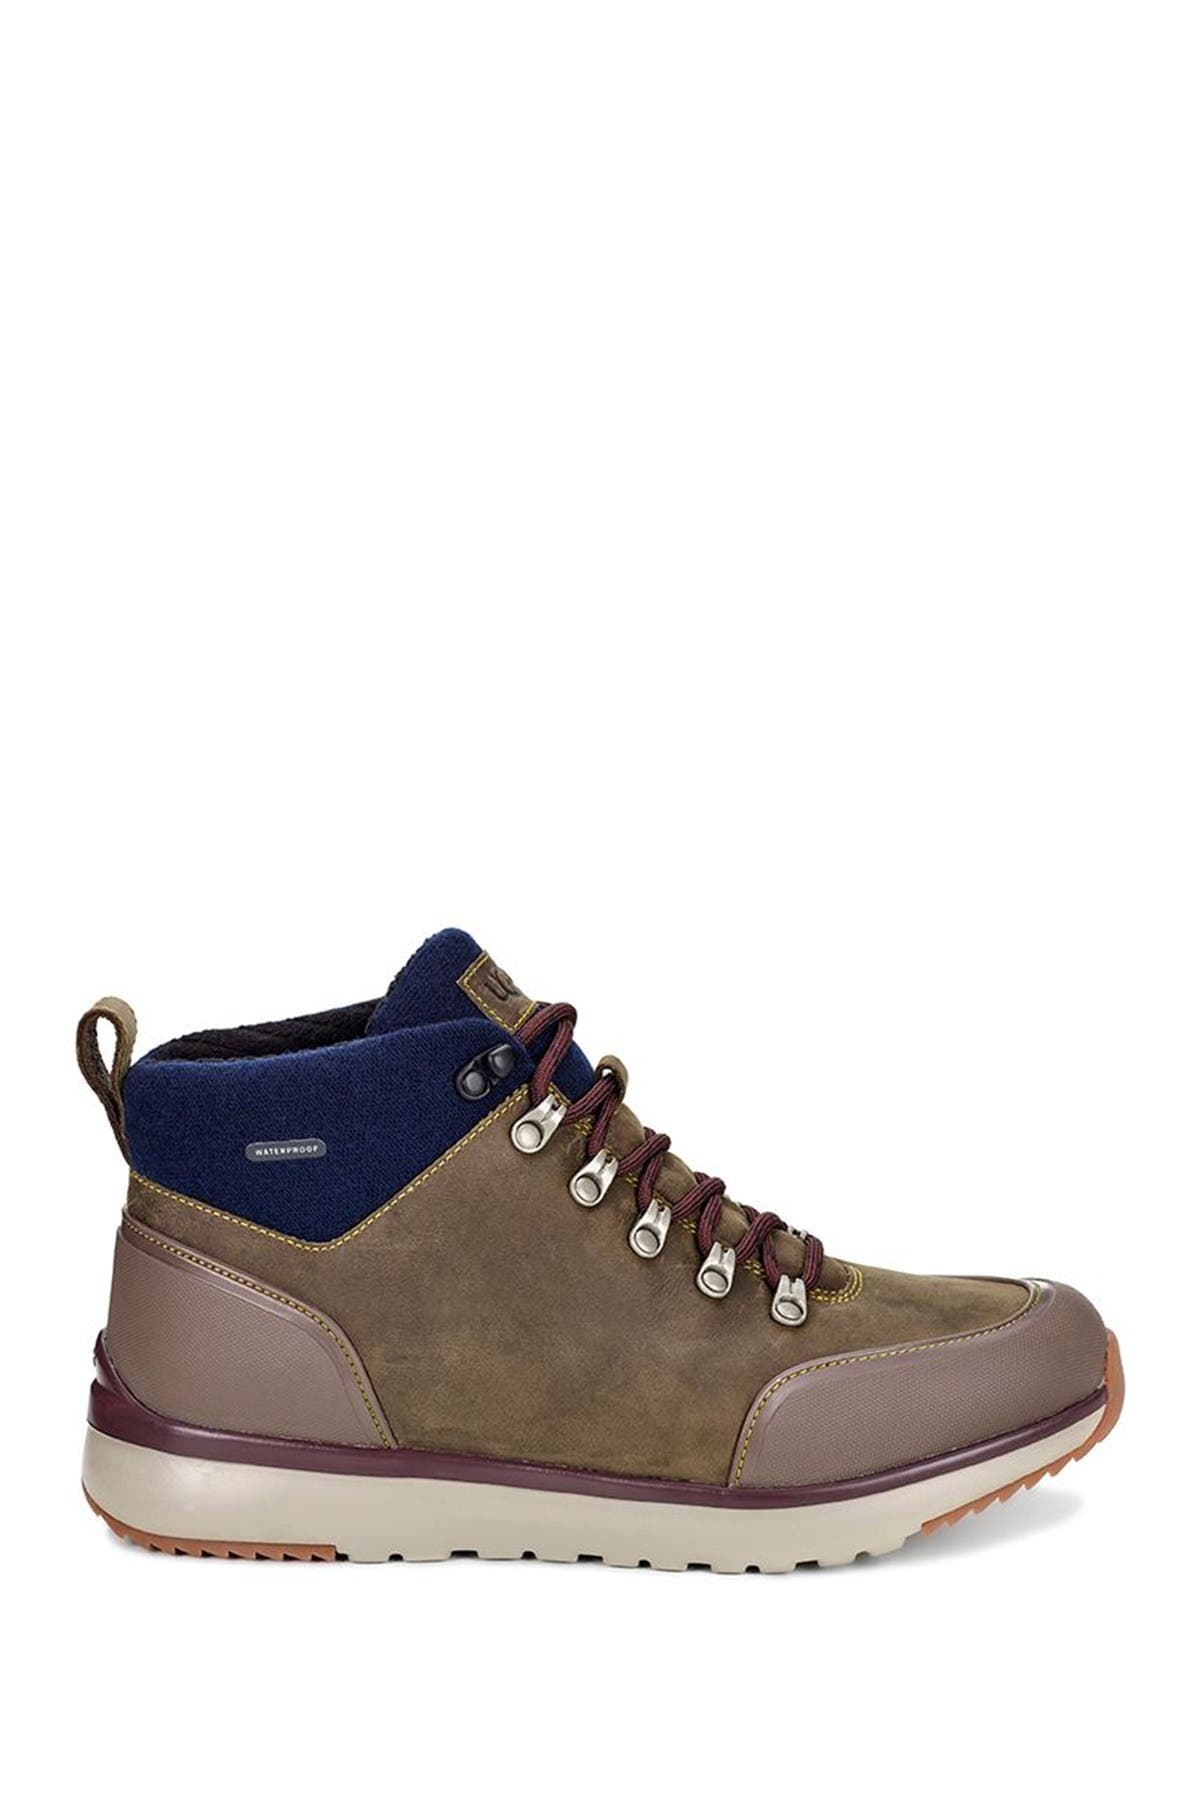 Image of UGG Olivert Waterproof Leather Boot